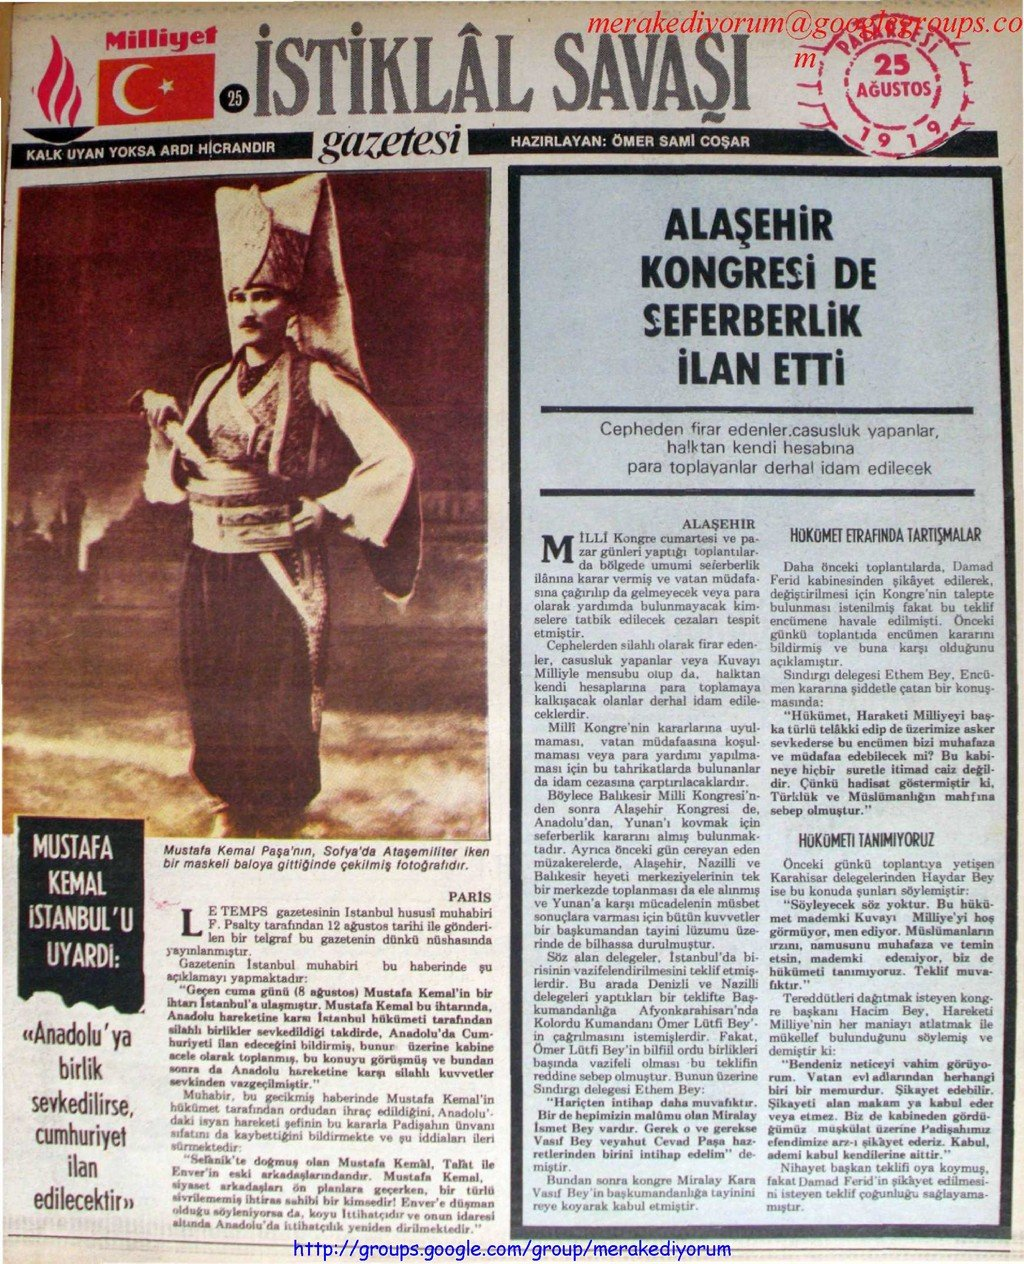 istiklal savaşı gazetesi - 25 ağustos 1919